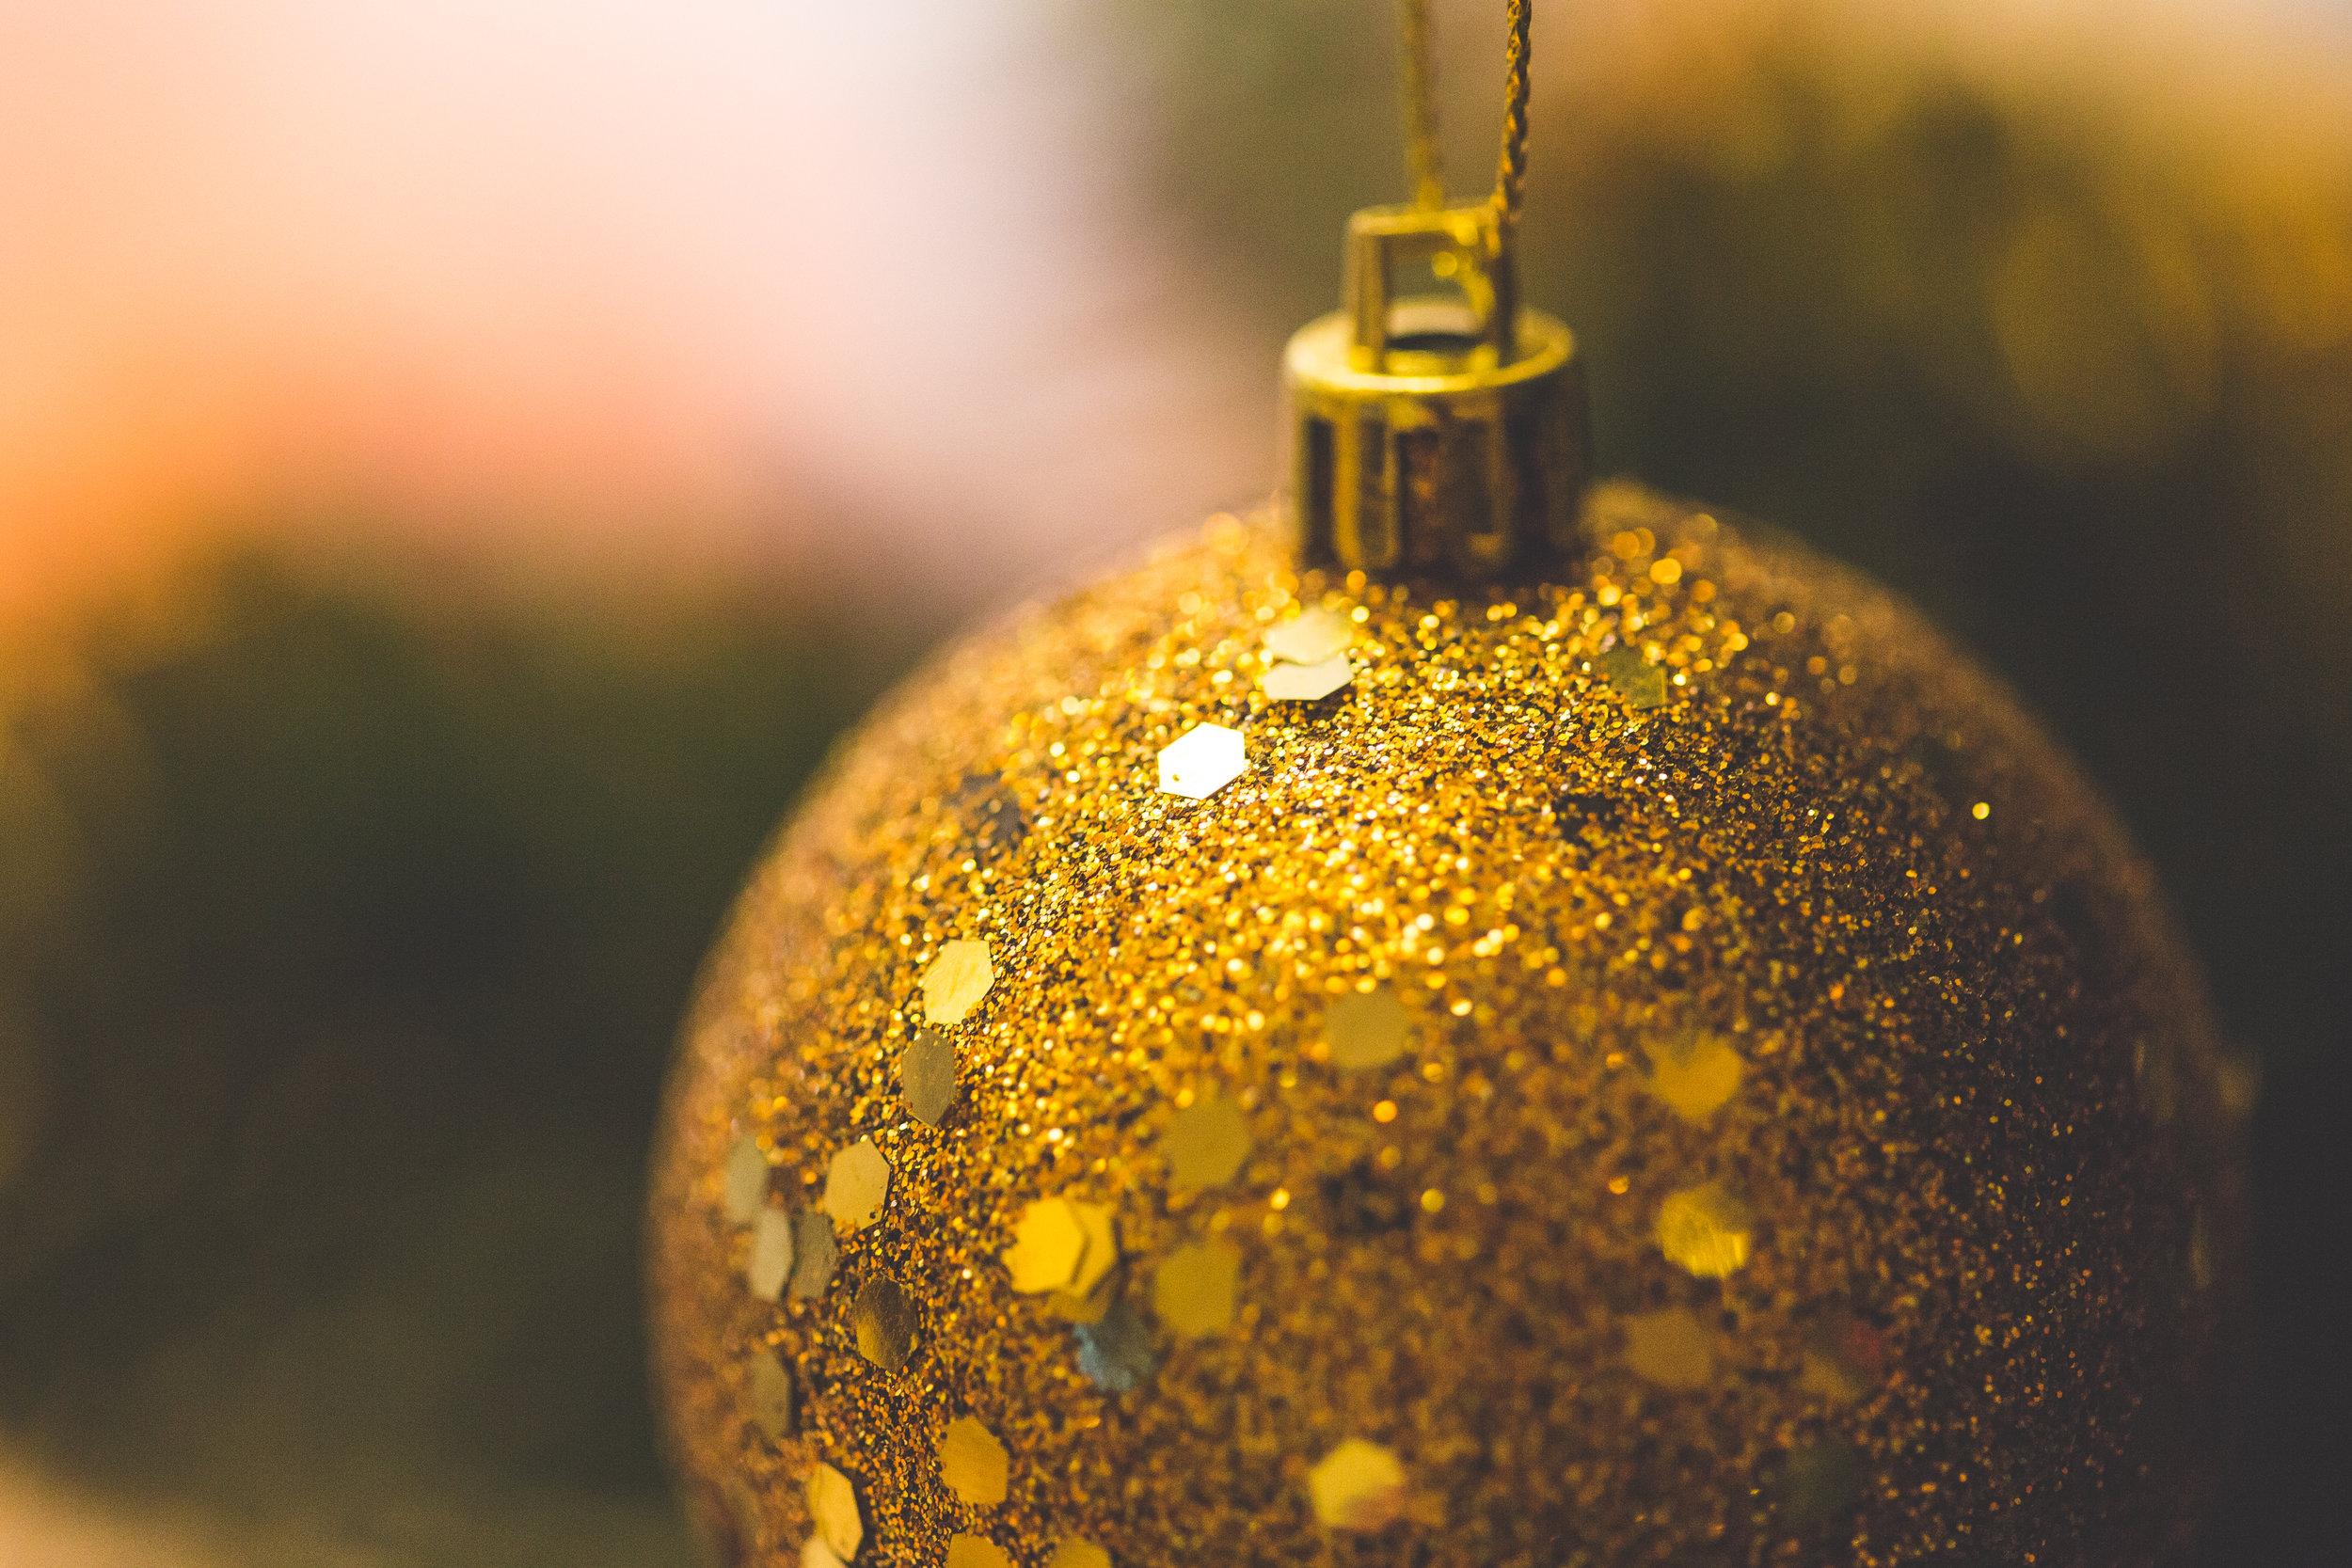 glitter-christmas-decoration-close-up-picjumbo-com.jpg